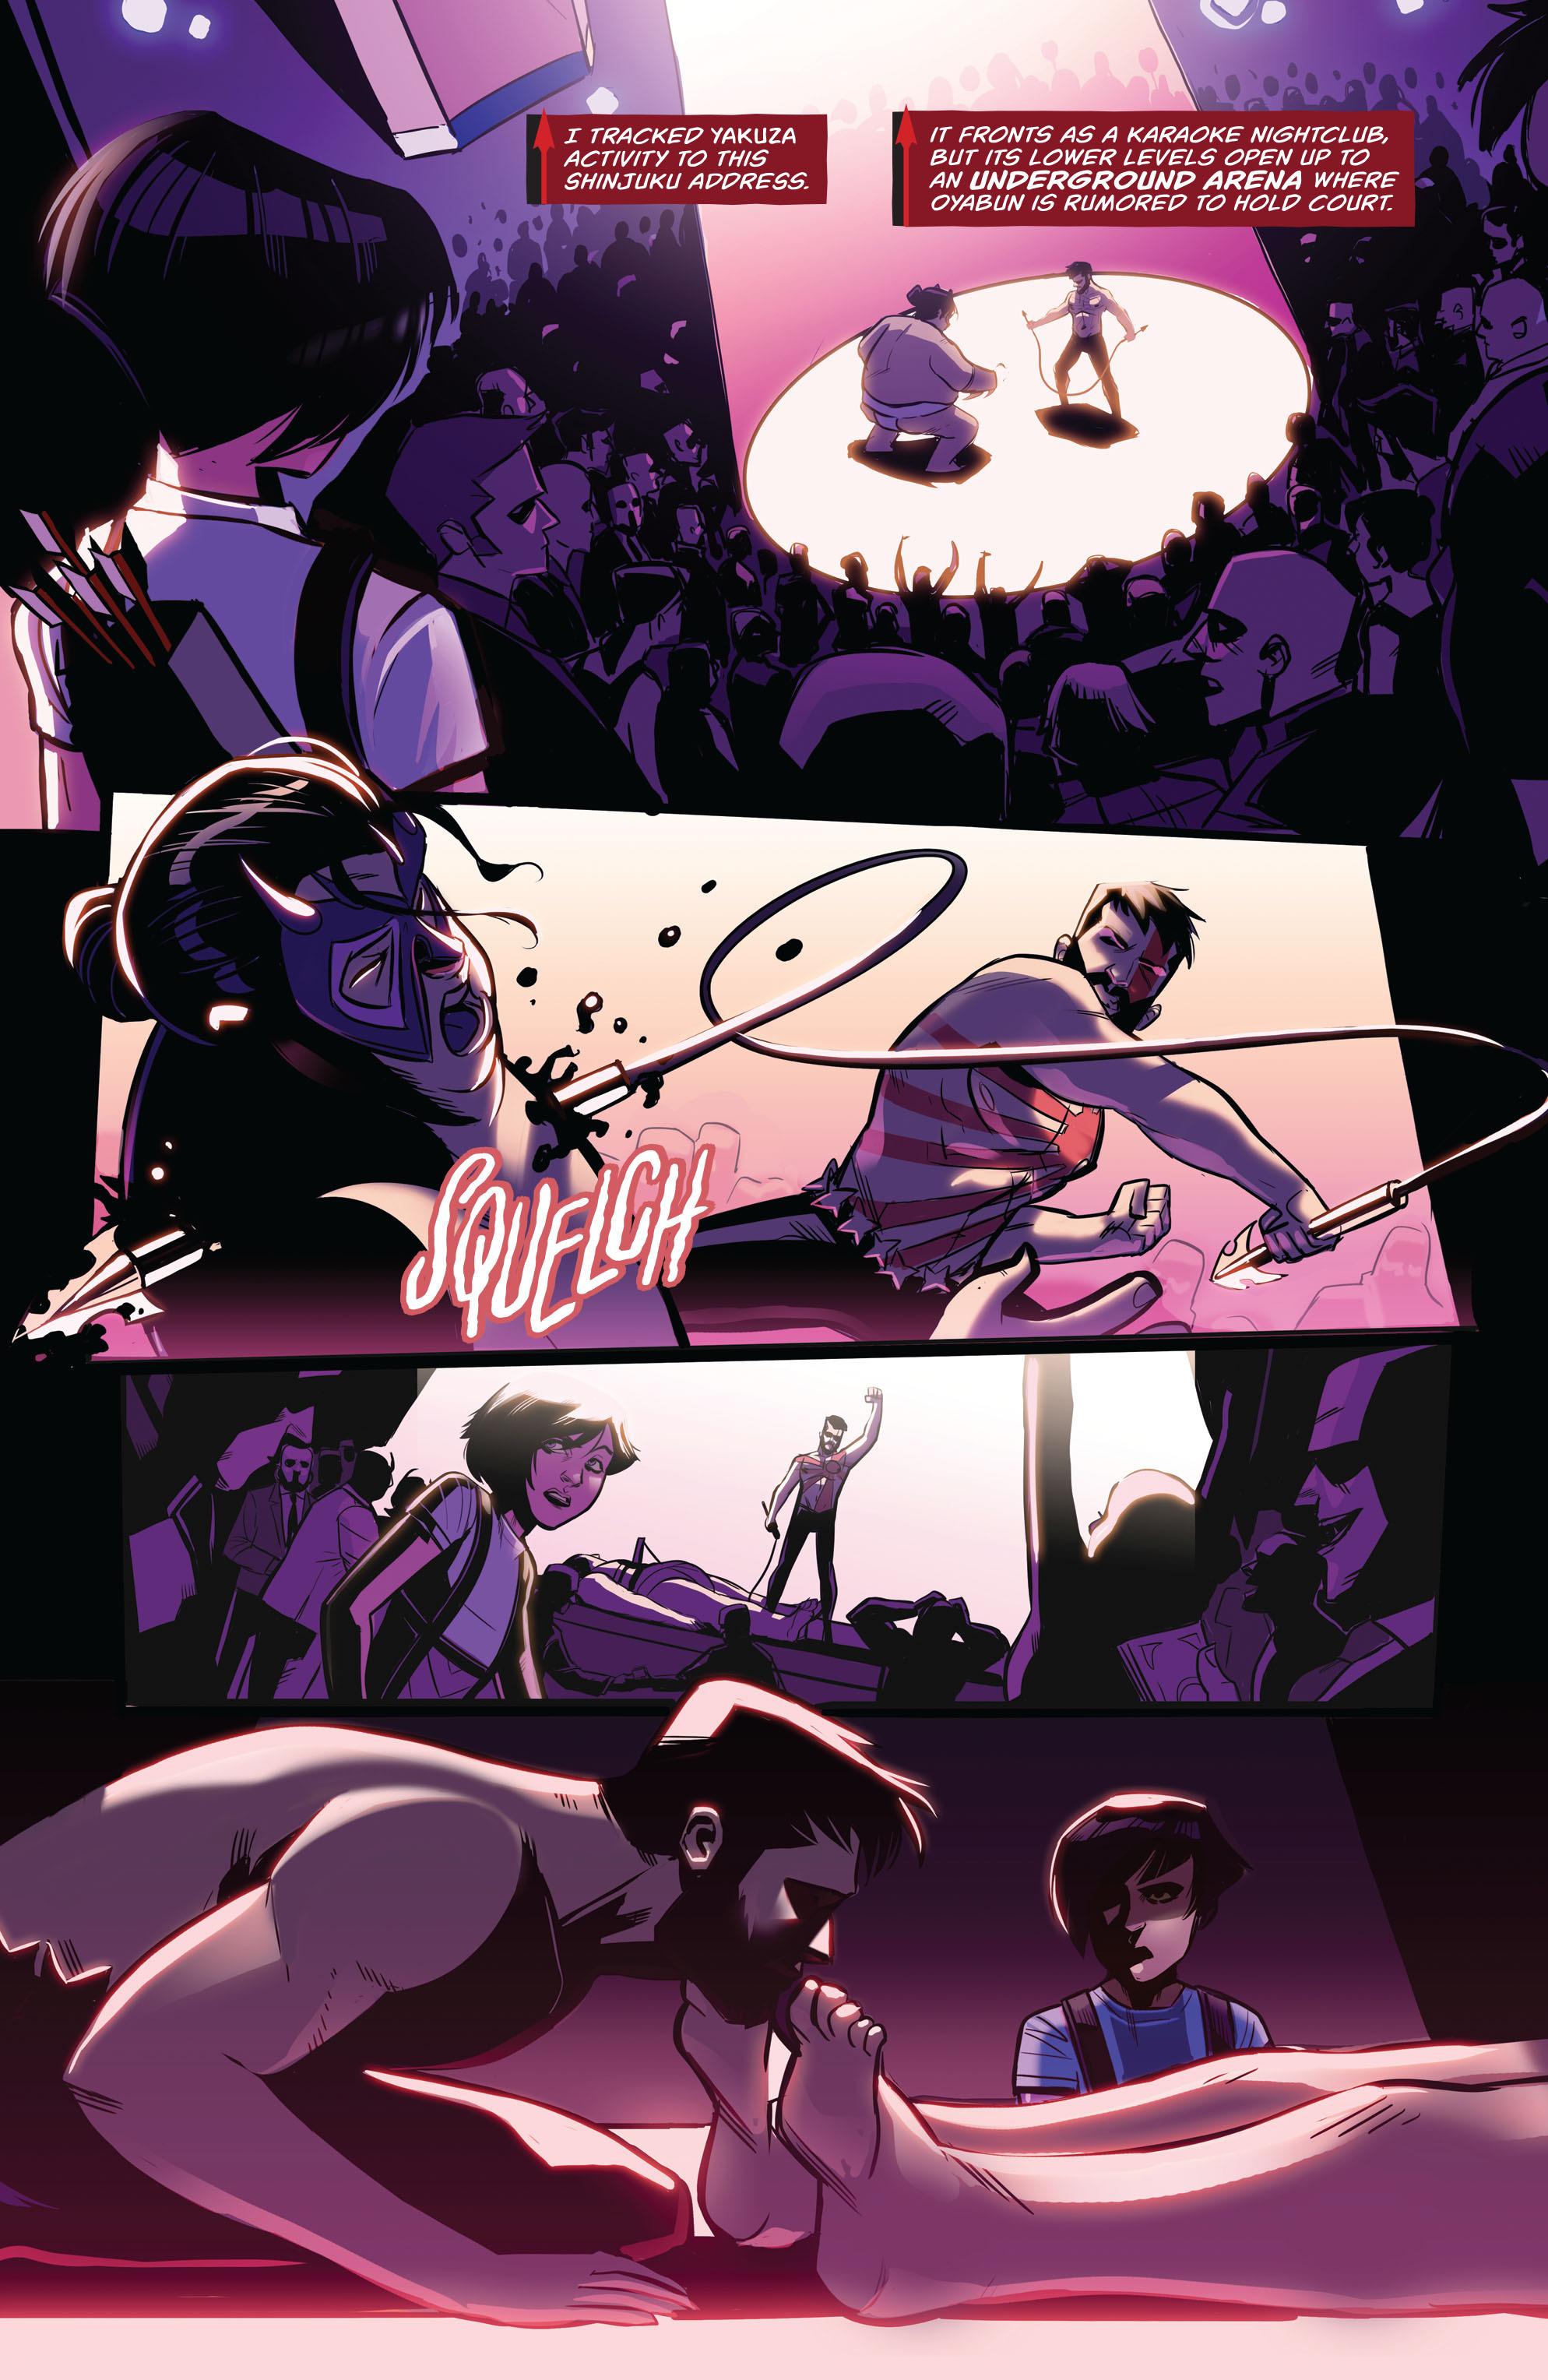 Emiko Queen Fights In The Yakuza Underground Arena